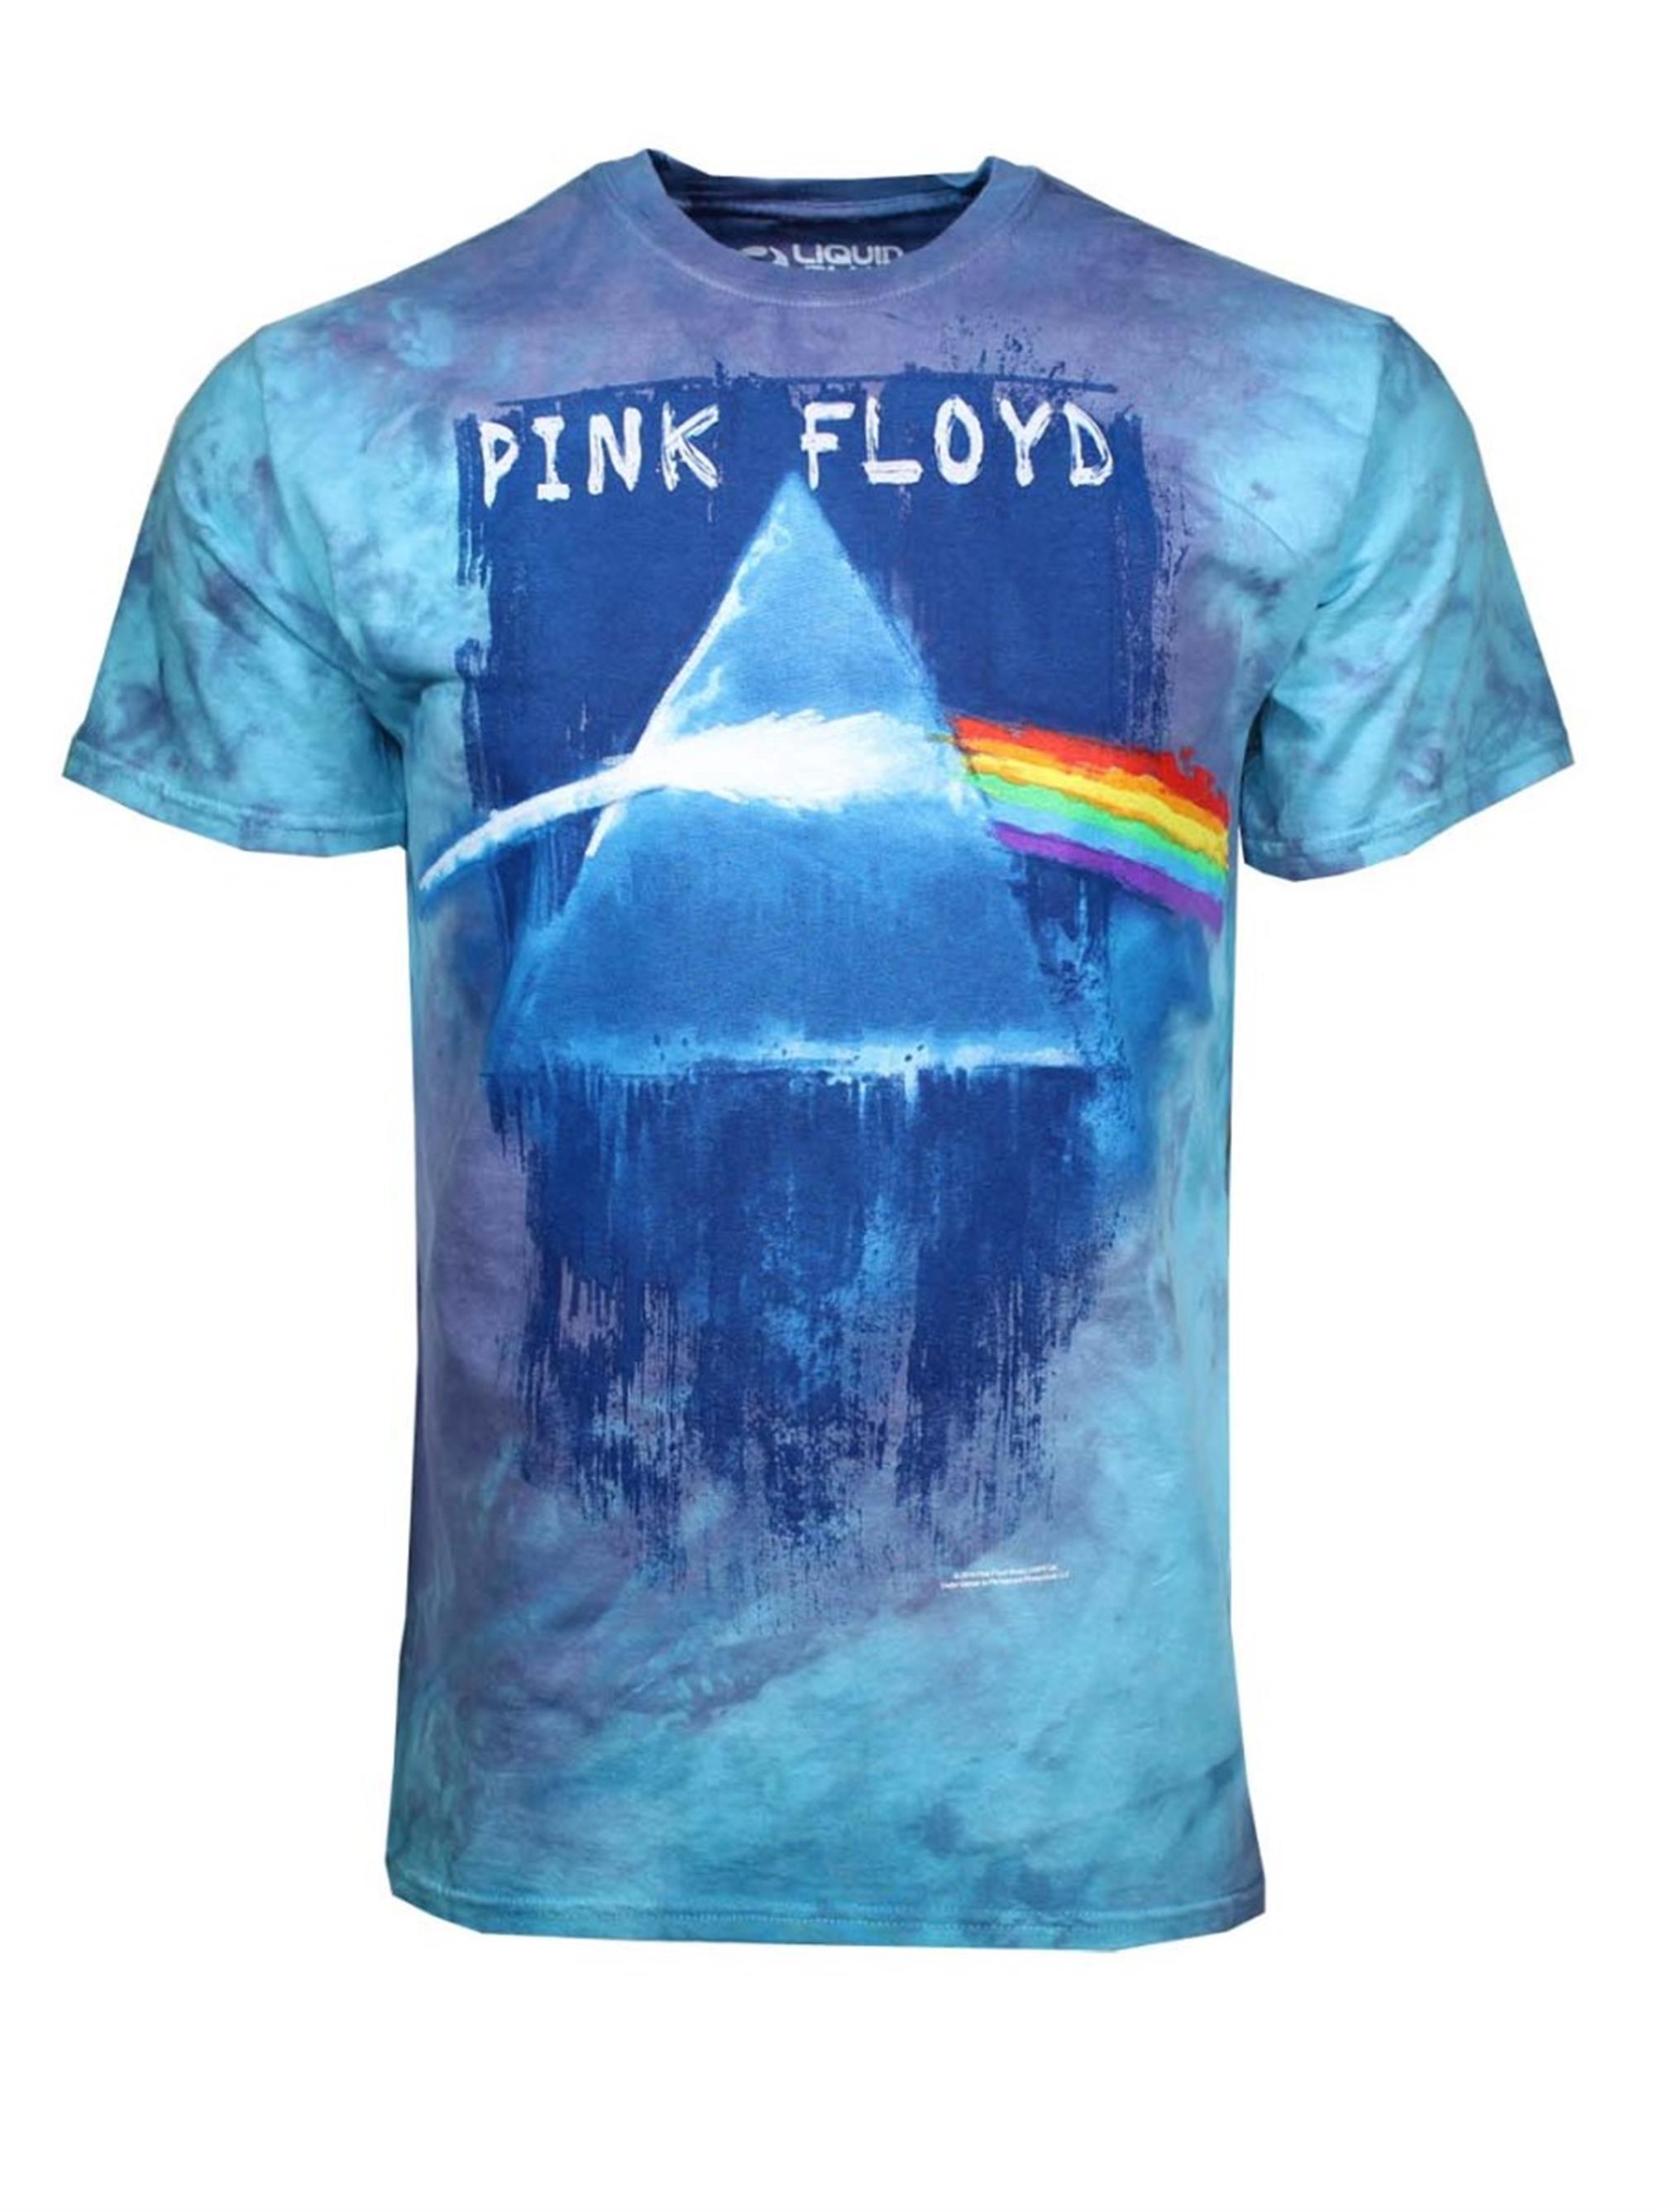 Pink Floyd Prism Paint Tie Dye T-Shirt